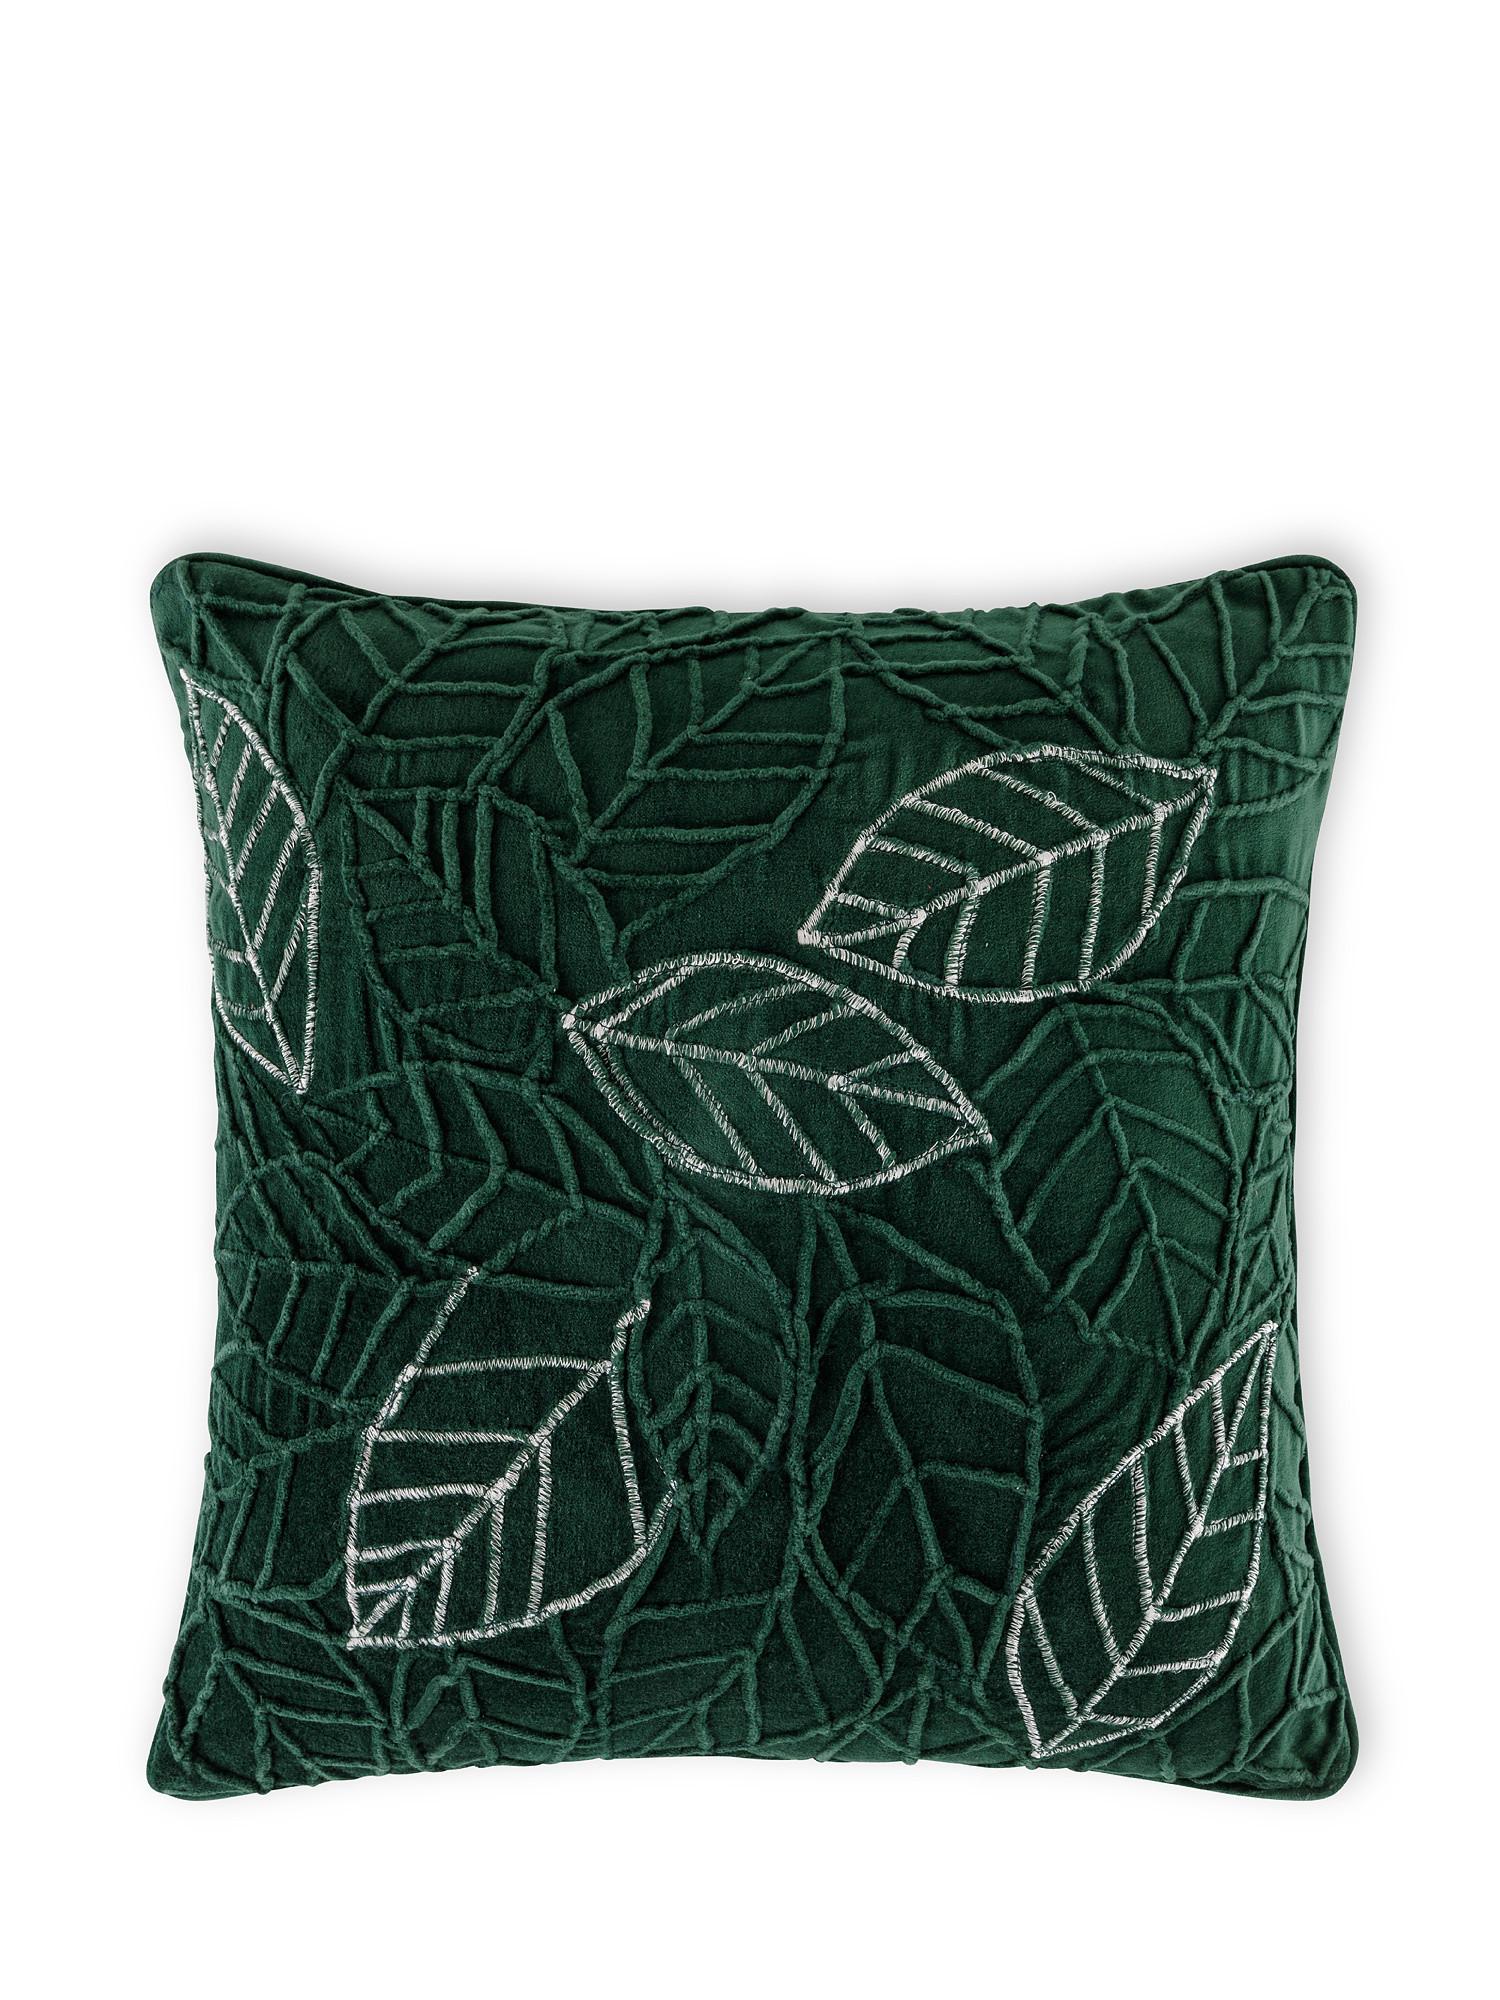 Cuscino velluto motivo foglie 45x45cm, Verde, large image number 0